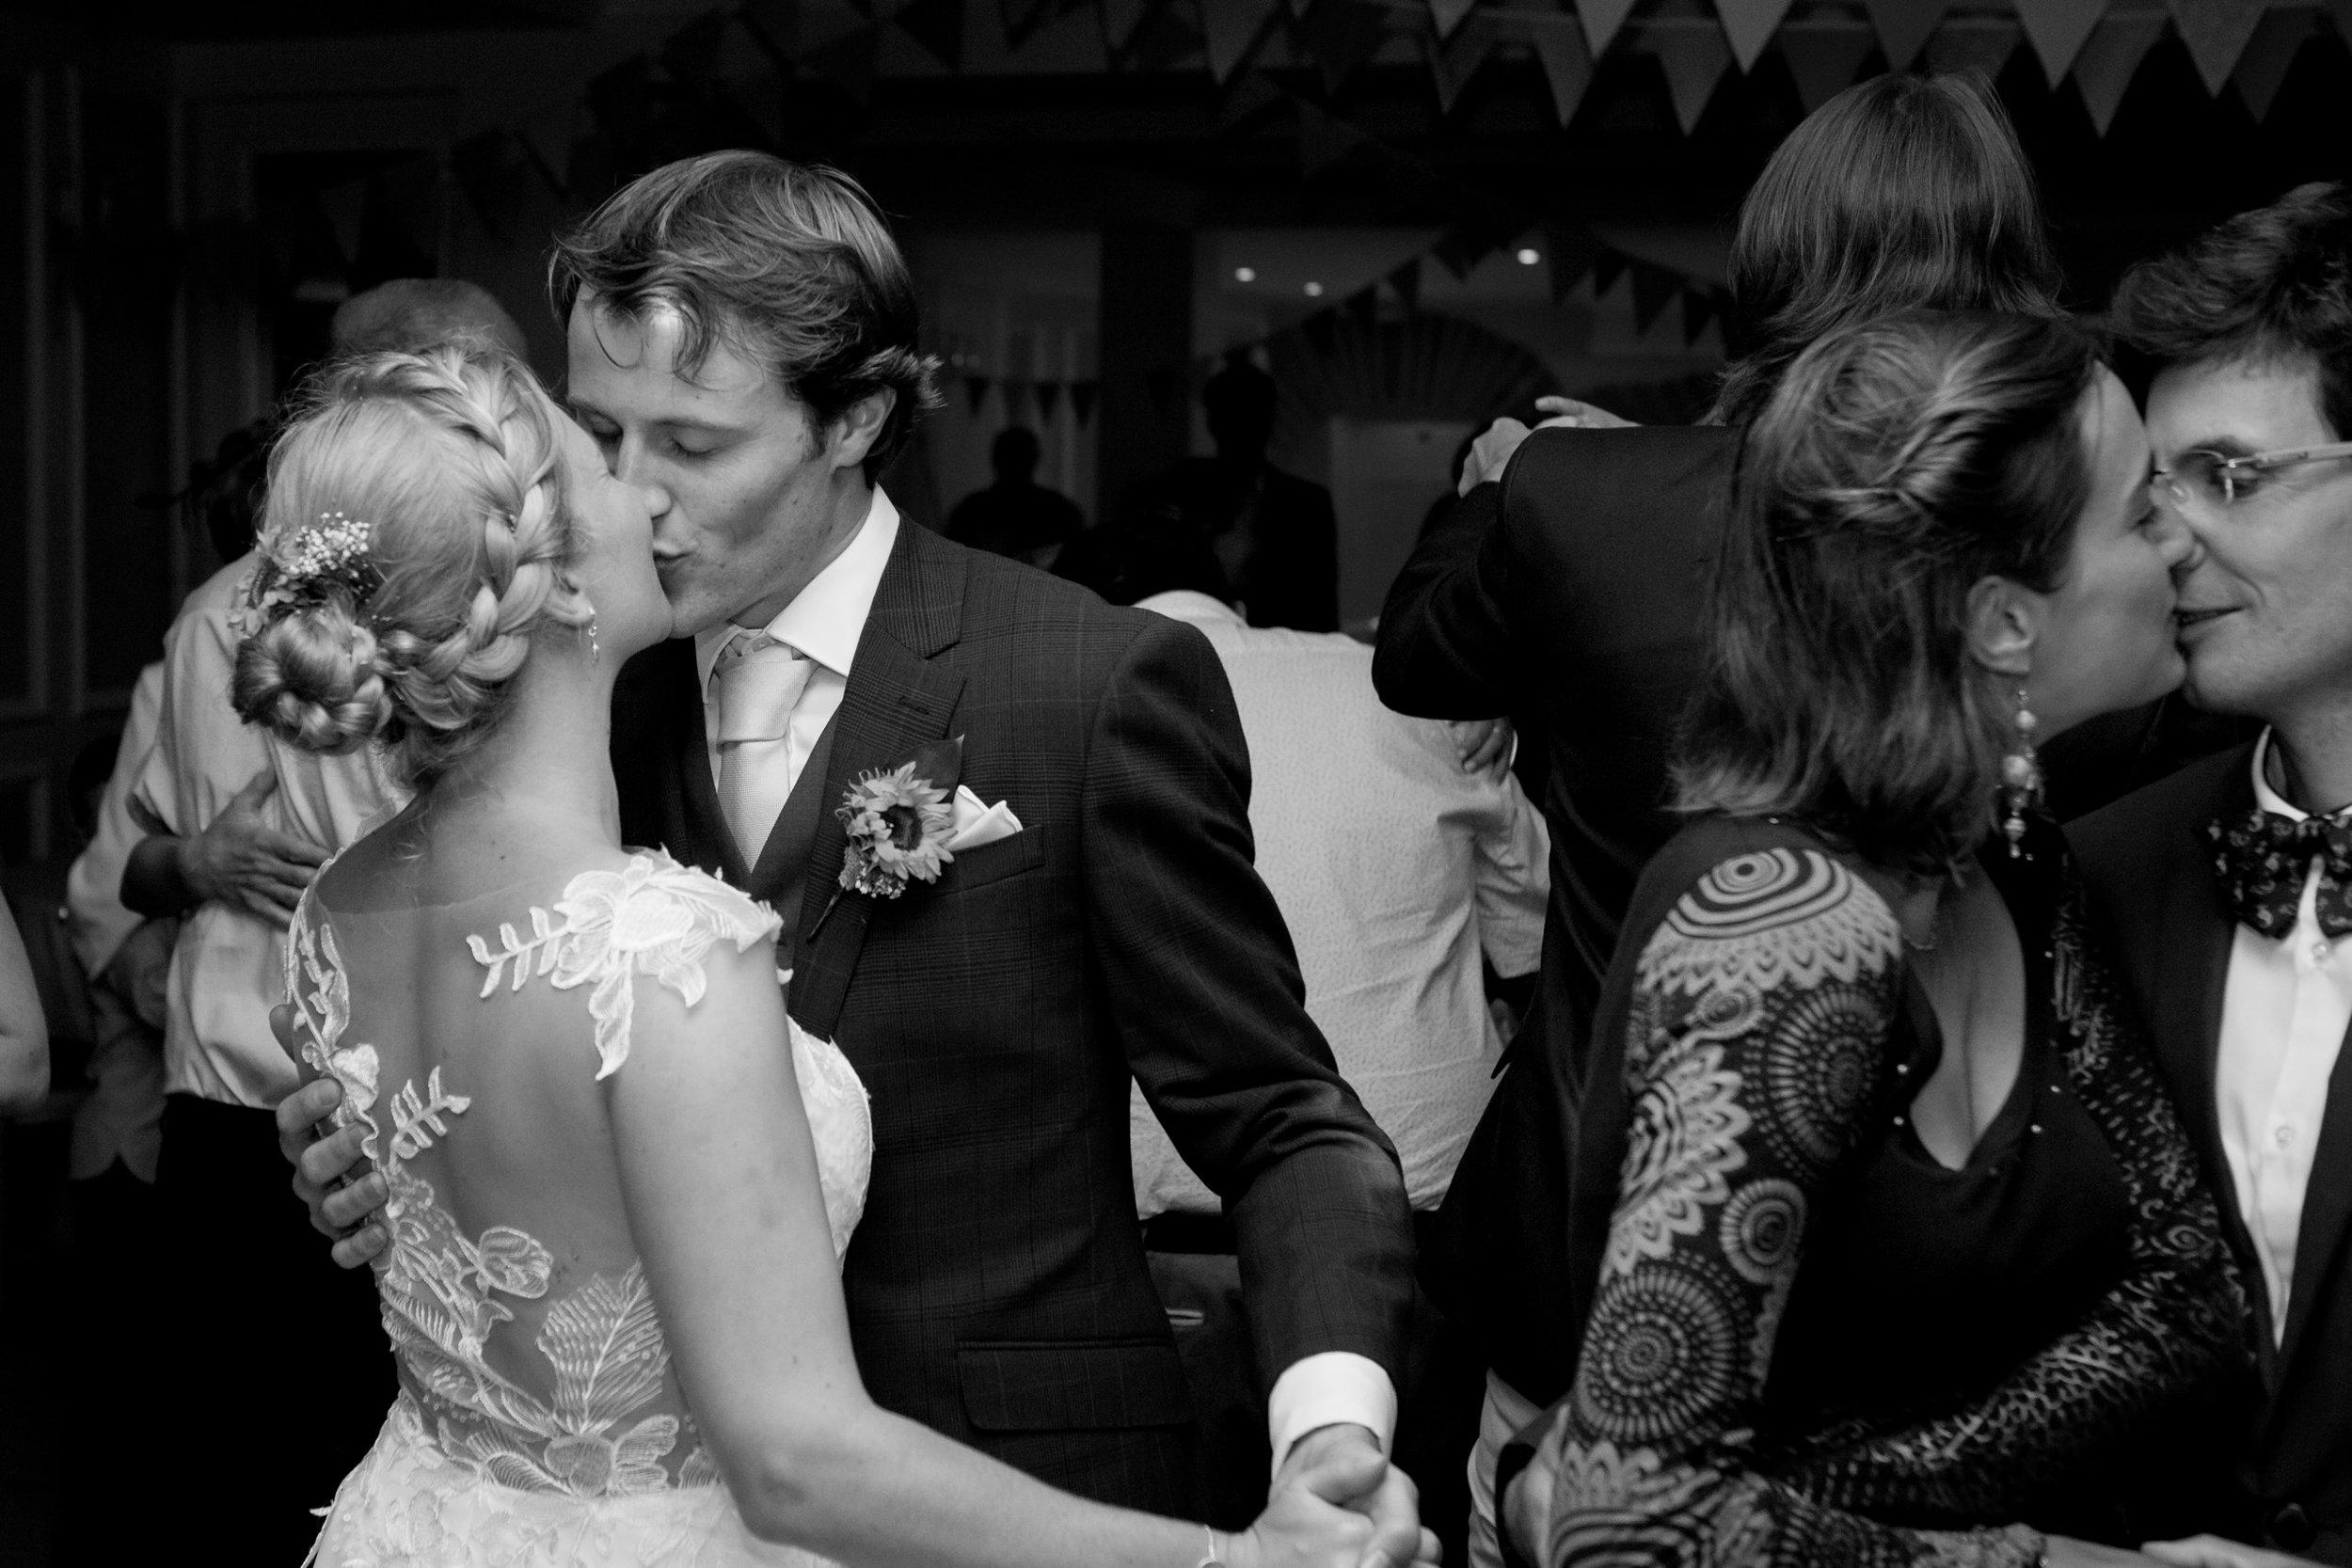 Bucklands-Tout-Saints-Hotel-Devon-Wedding-Photography-42.jpg